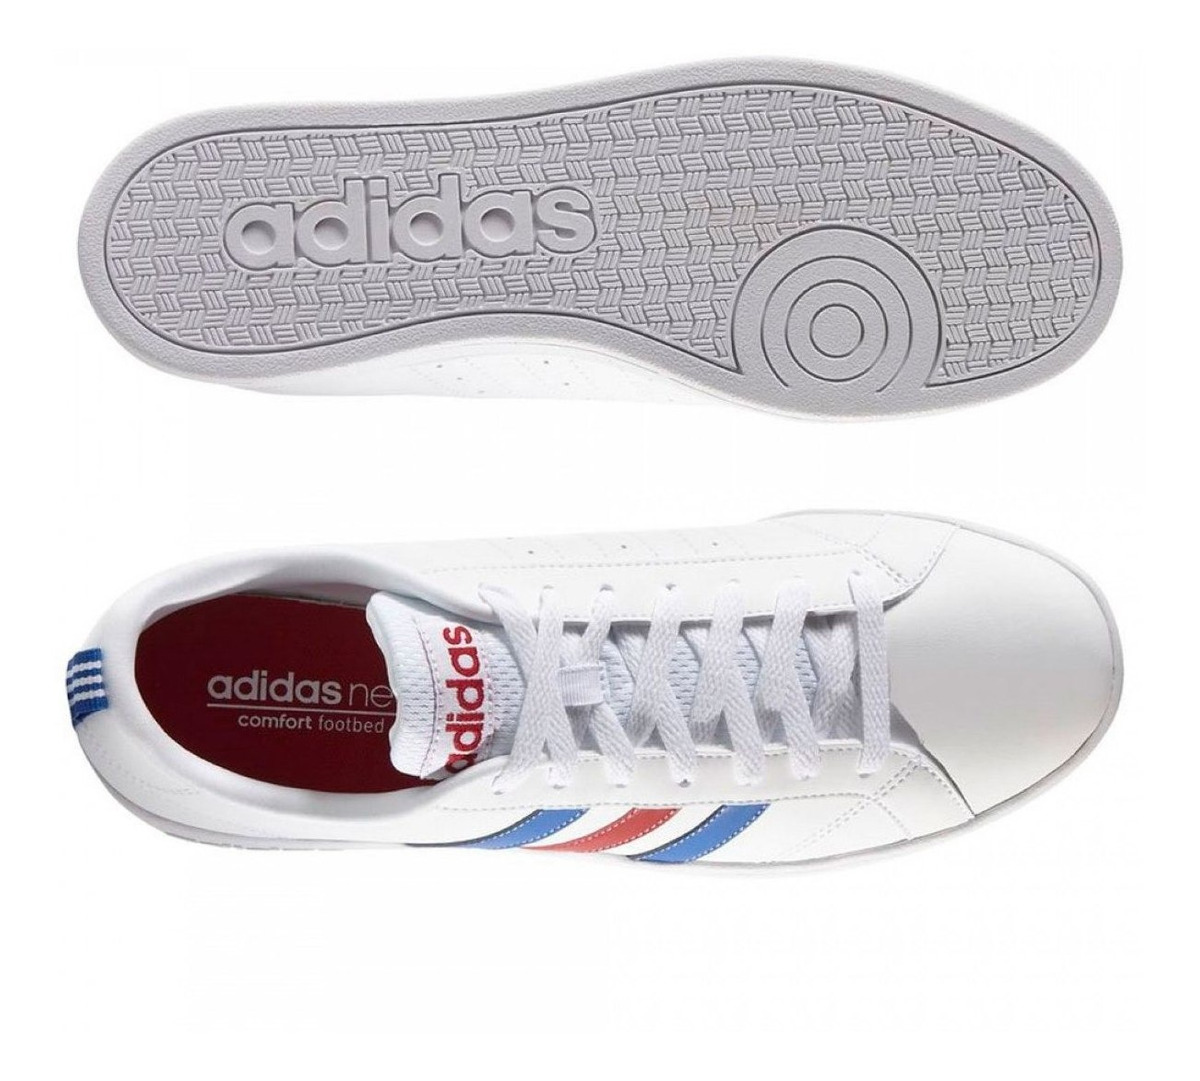 Tenis adidas Blancoazul Blancoazul Tenis Tenis Vs adidas Advantage Vs Advantage adidas Vs Advantage OkwPn0